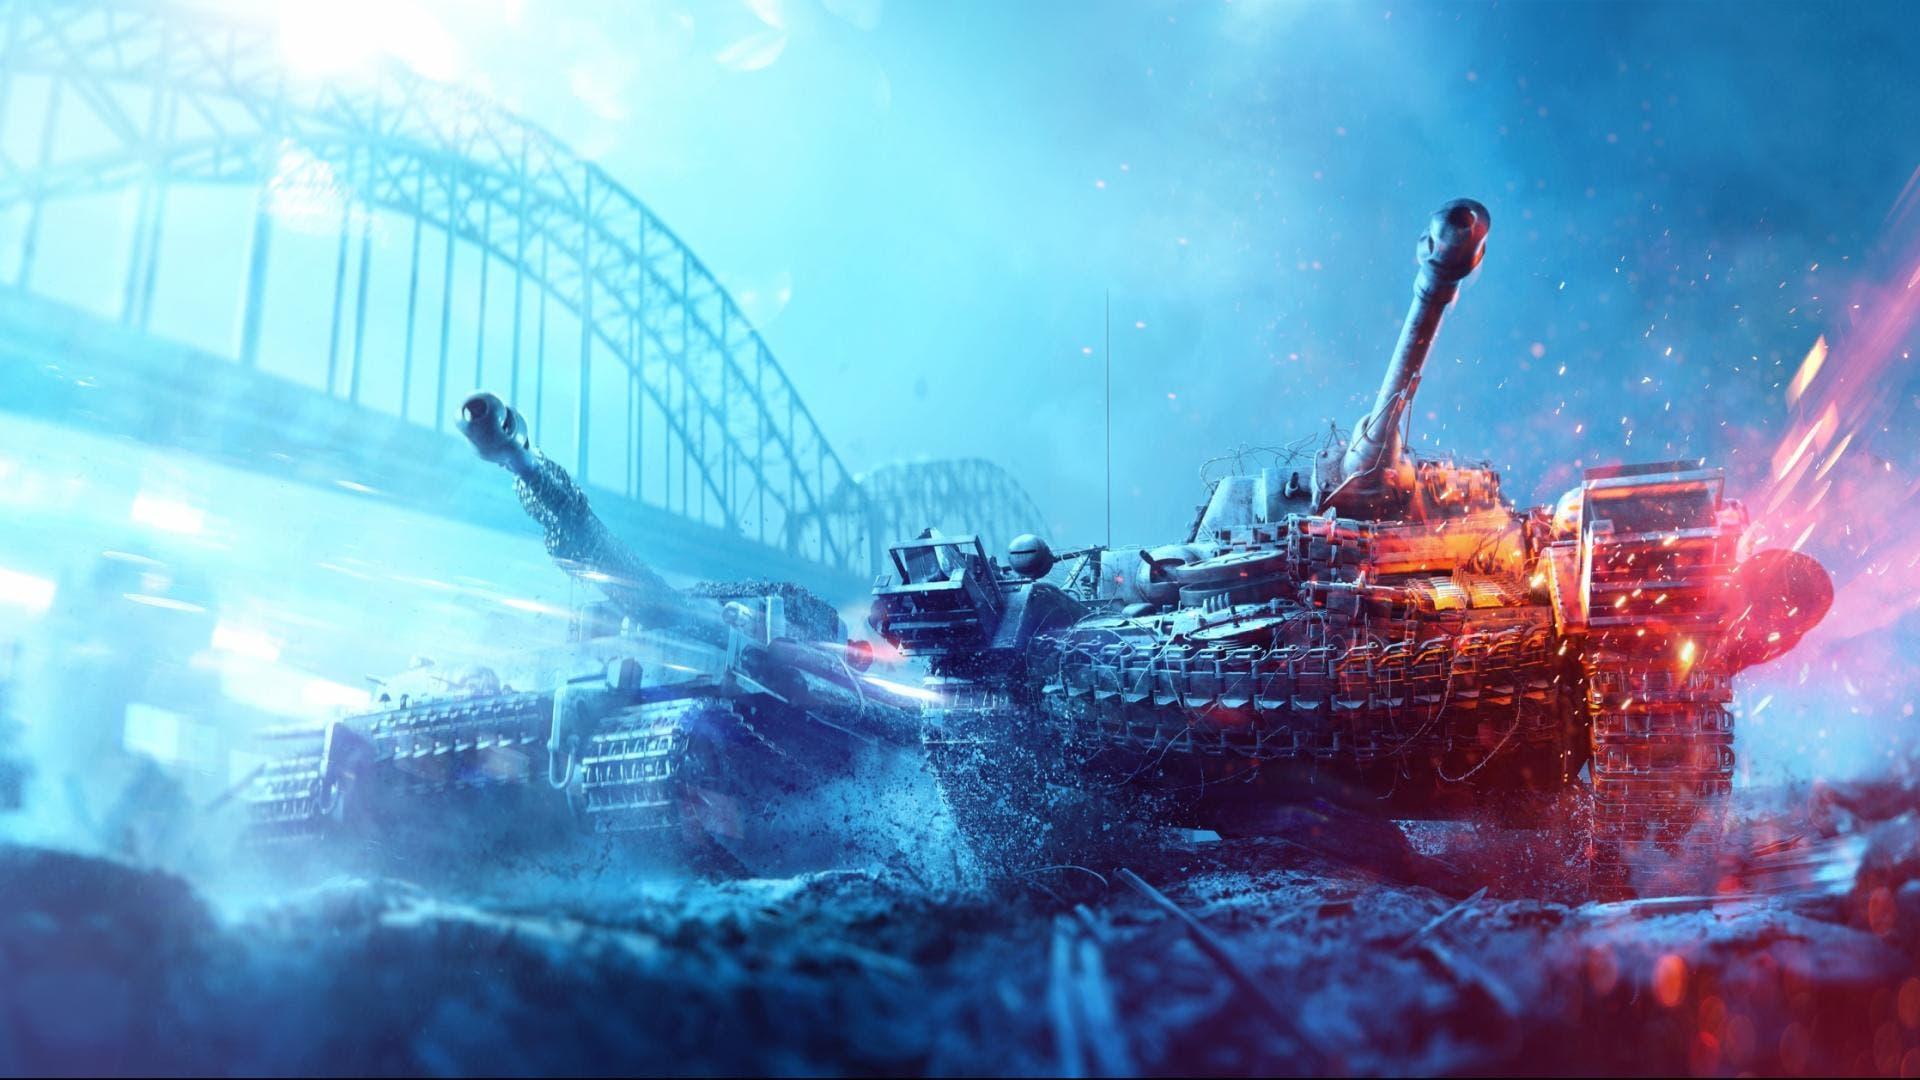 Battlefield V finalmente tendrá skins para los tanques 2